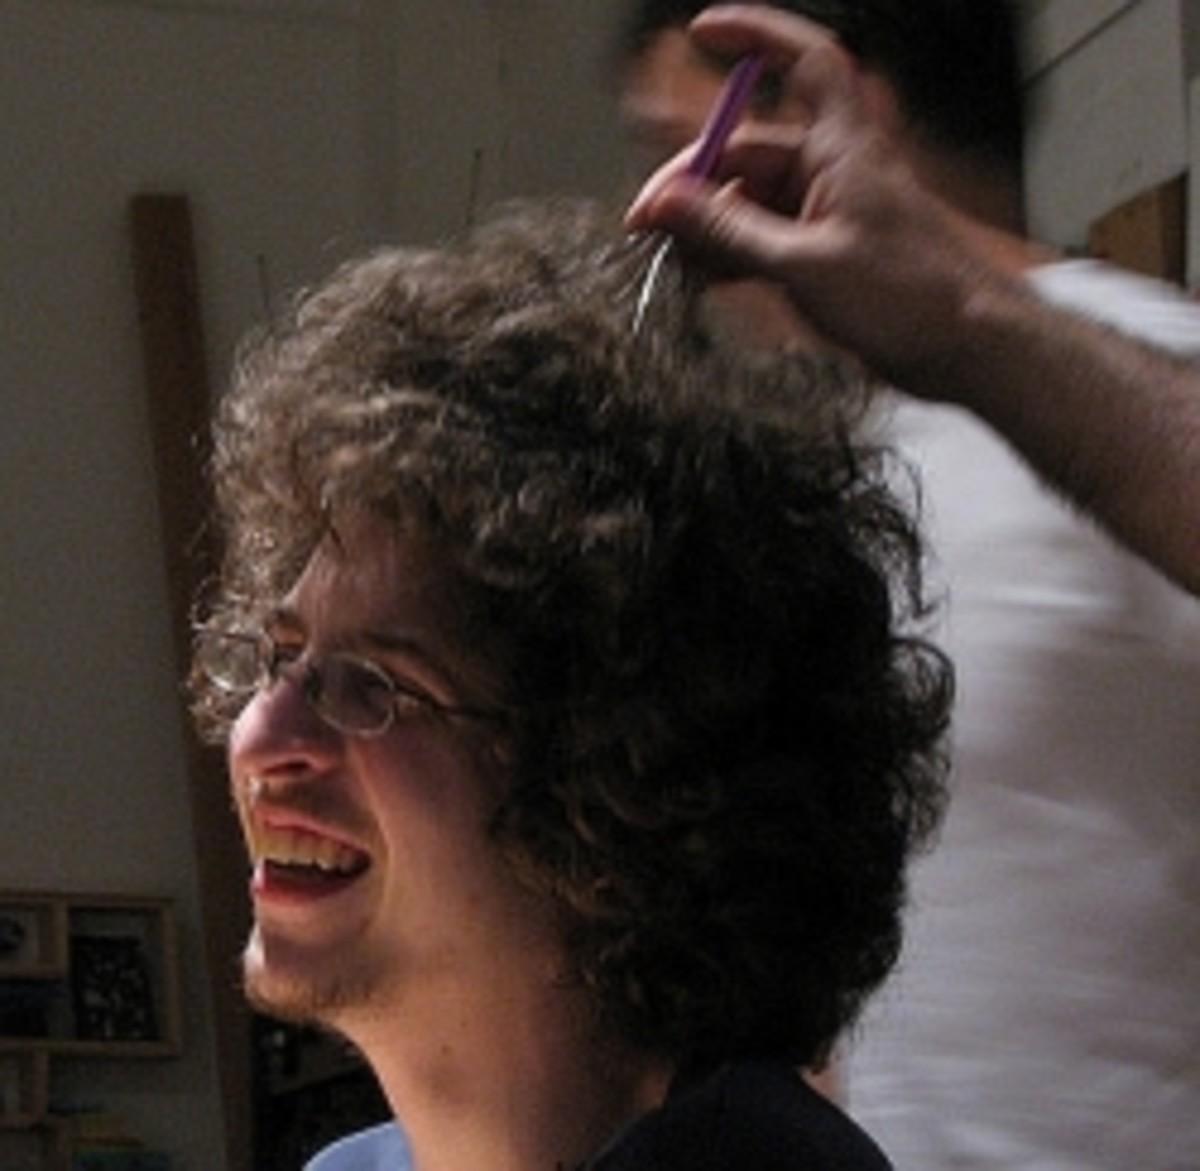 Head Massager Tingler in Action